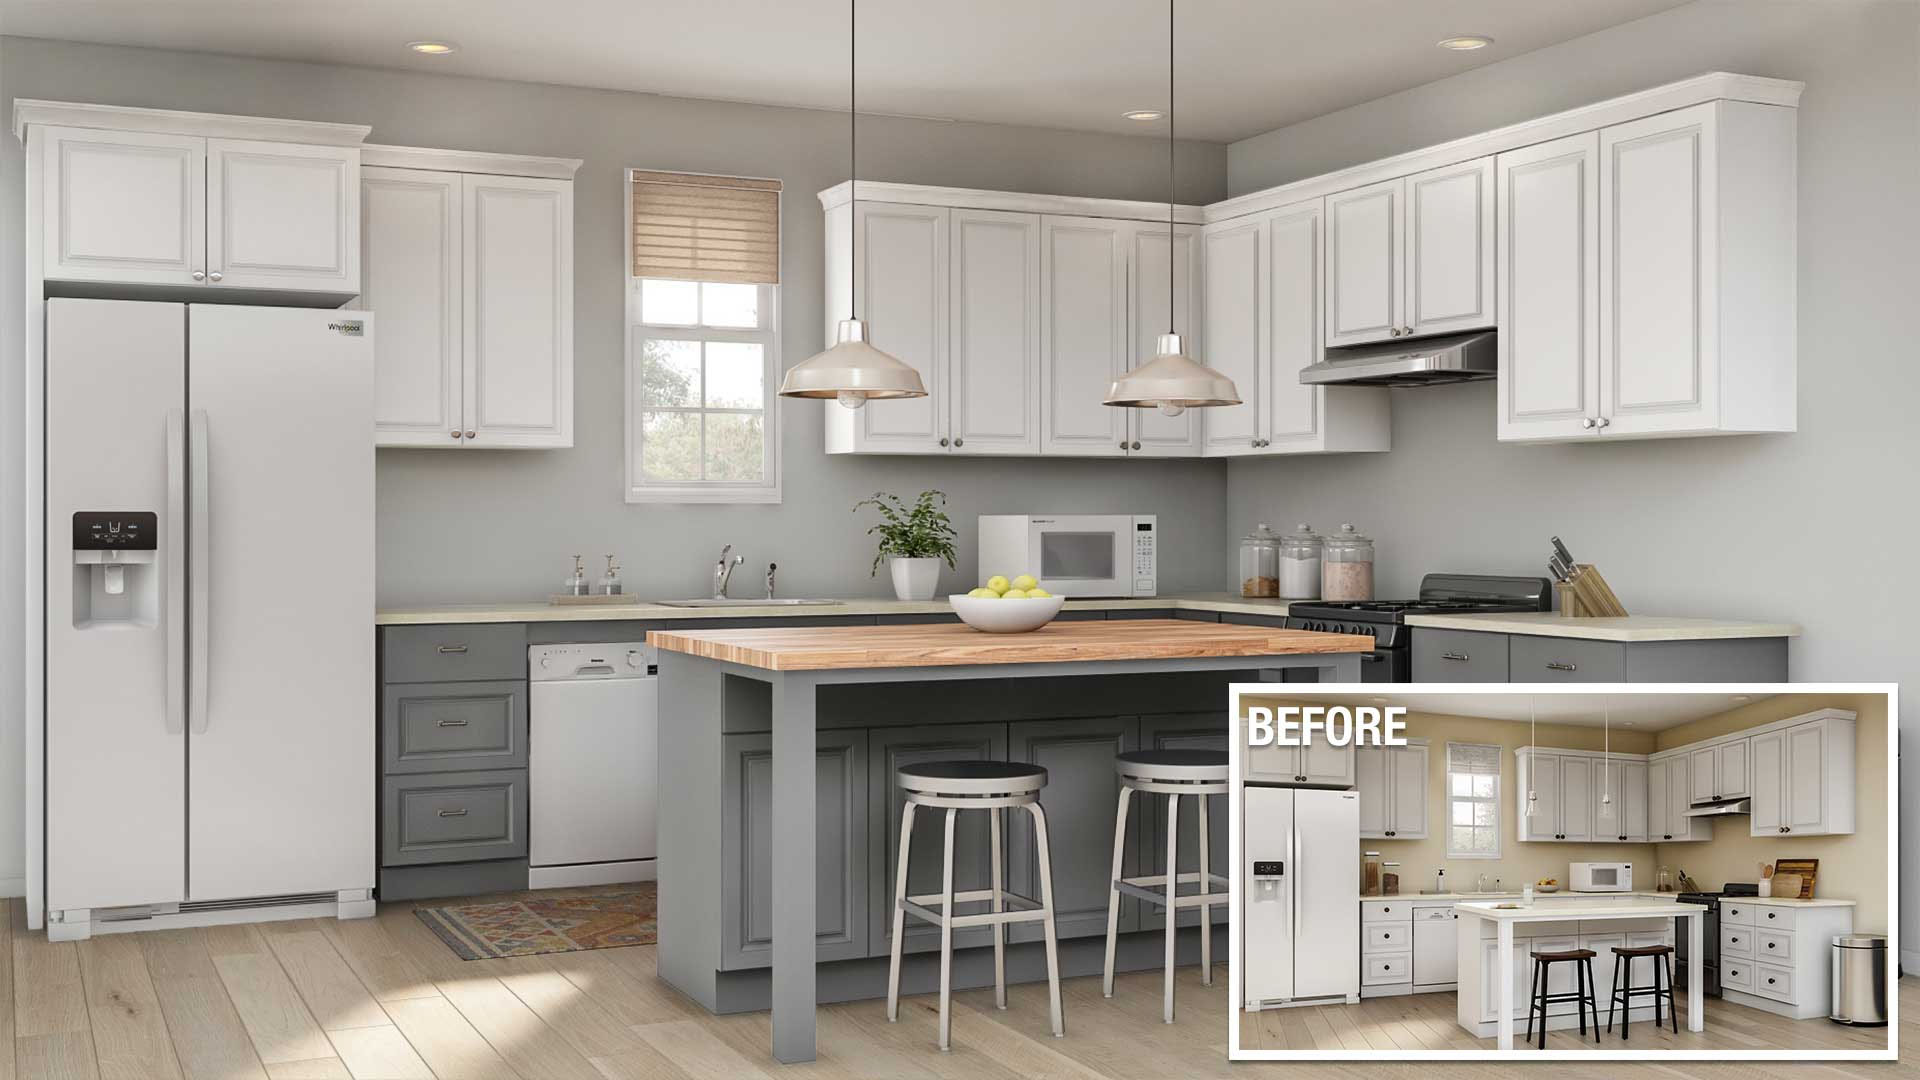 minor kitchen remodel cost in Orange County ca